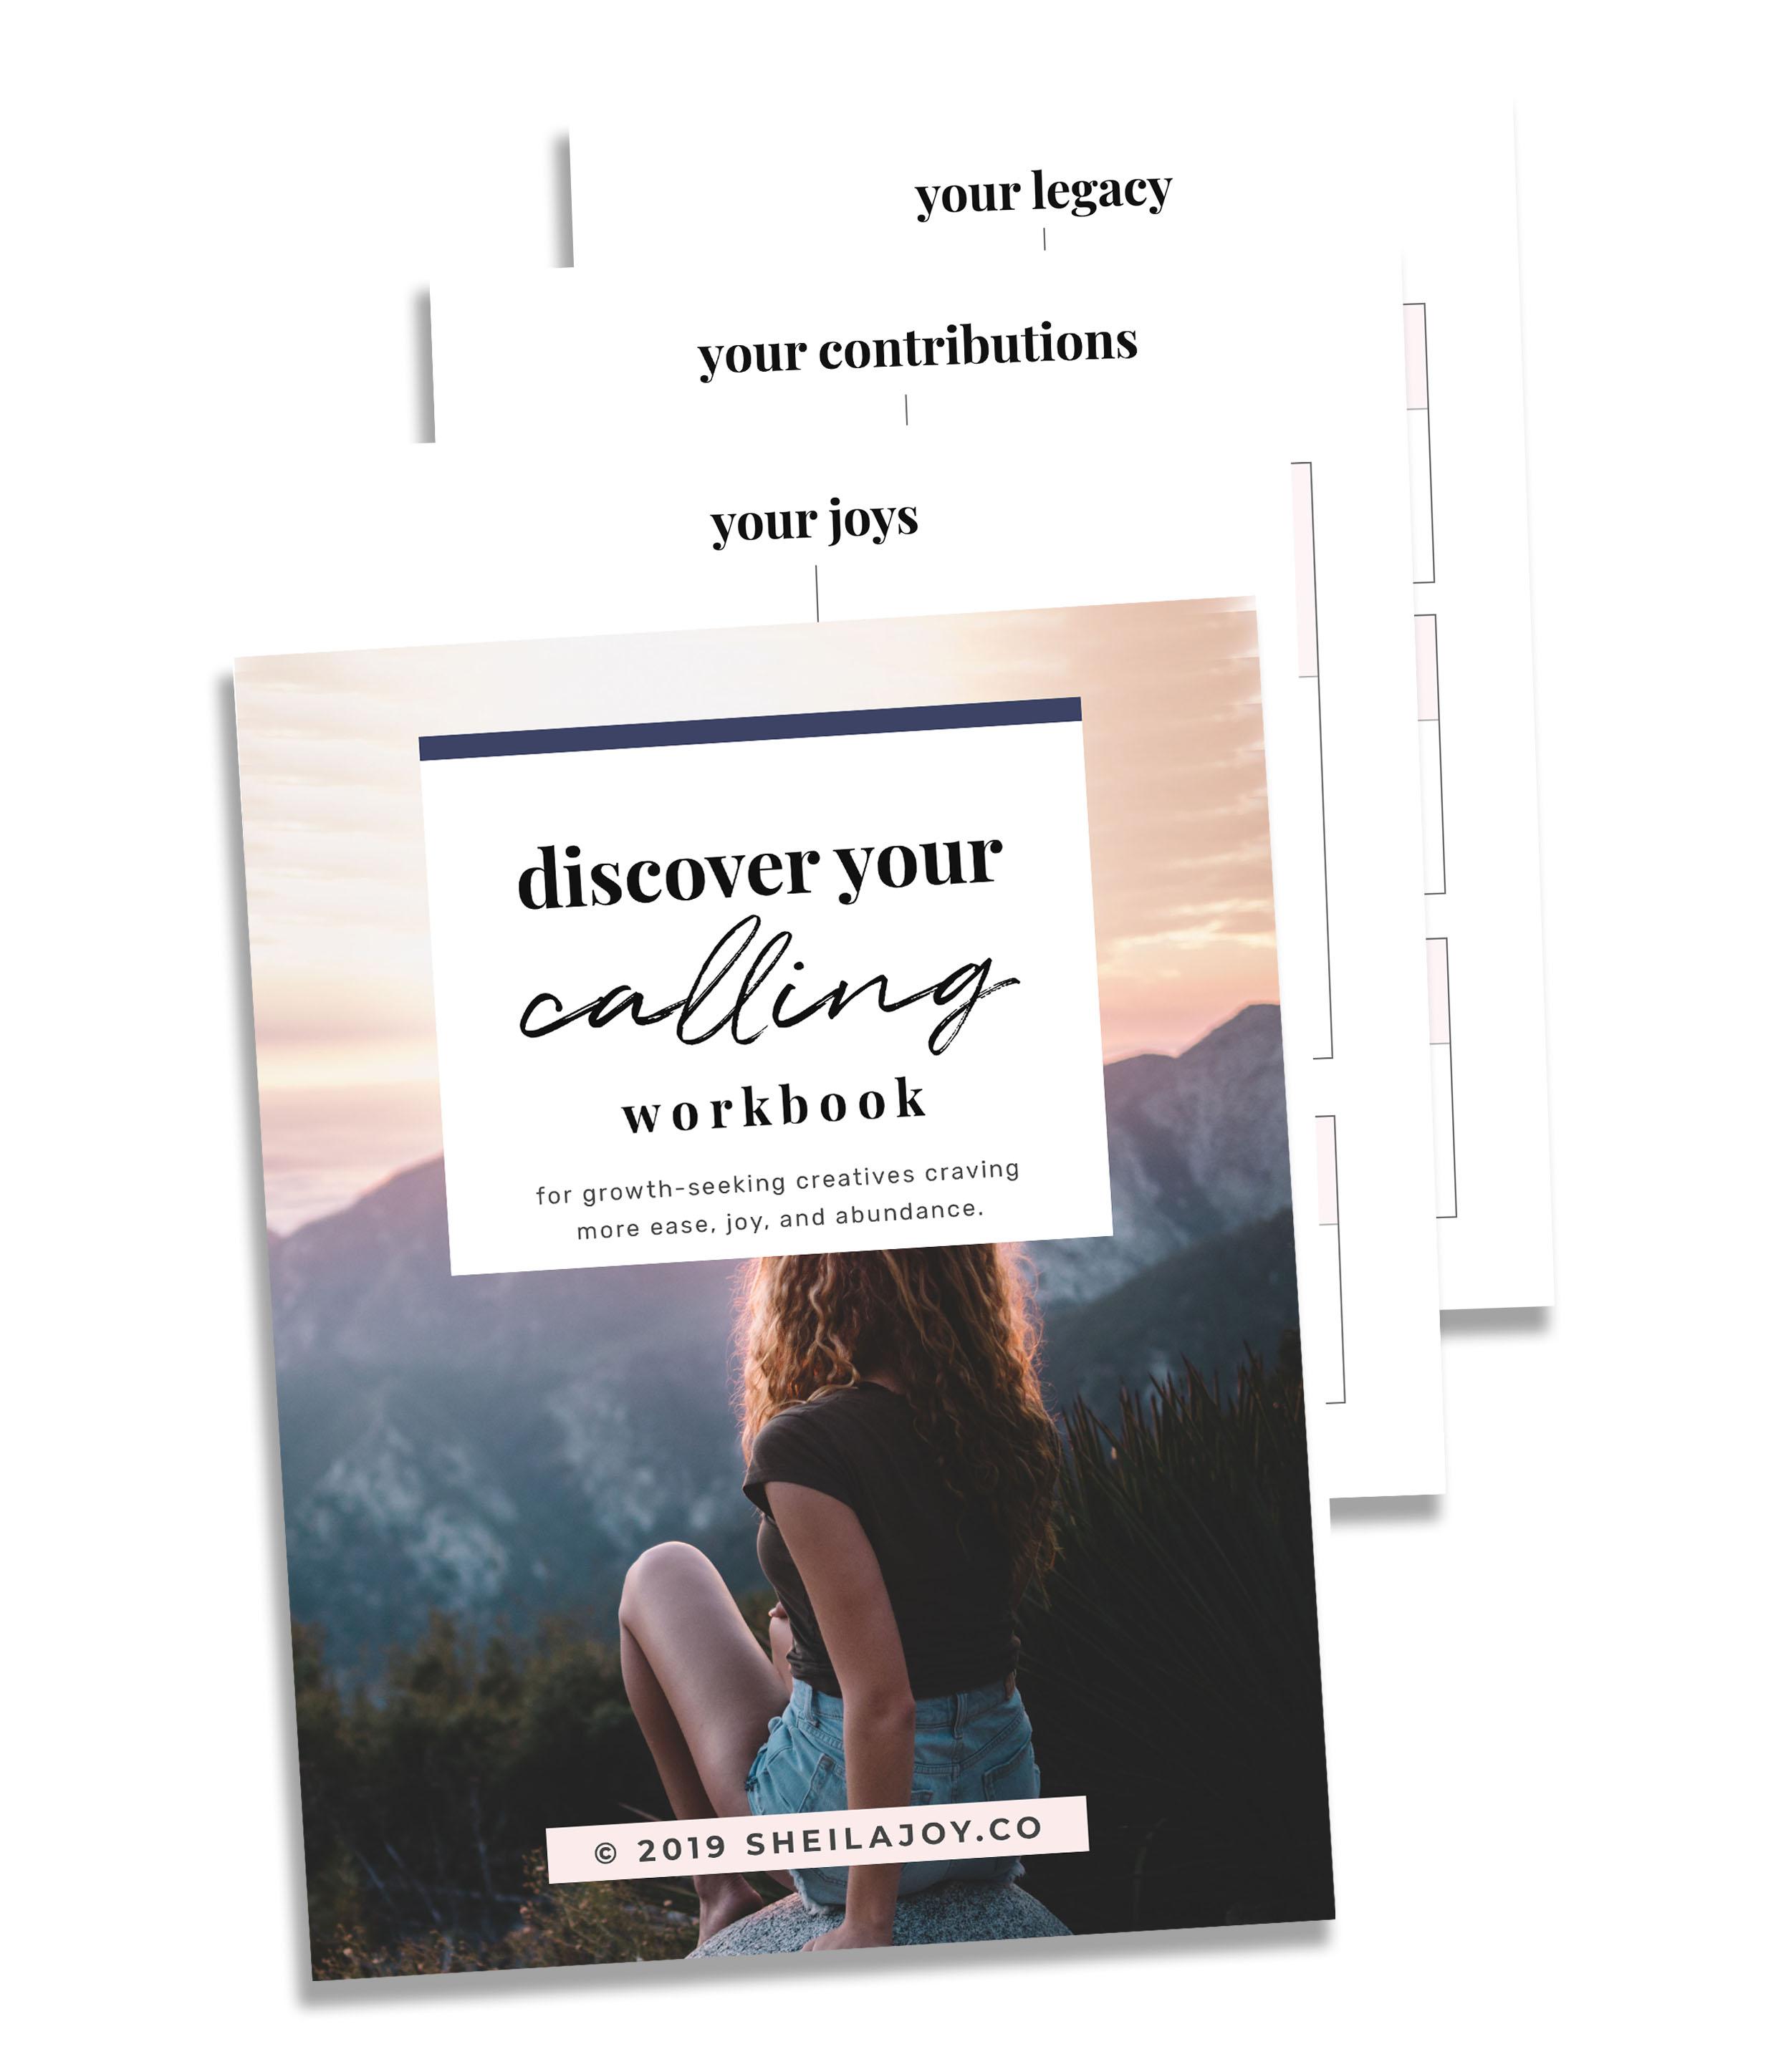 Mockup_Discover-Your-Calling-Workbook.jpg